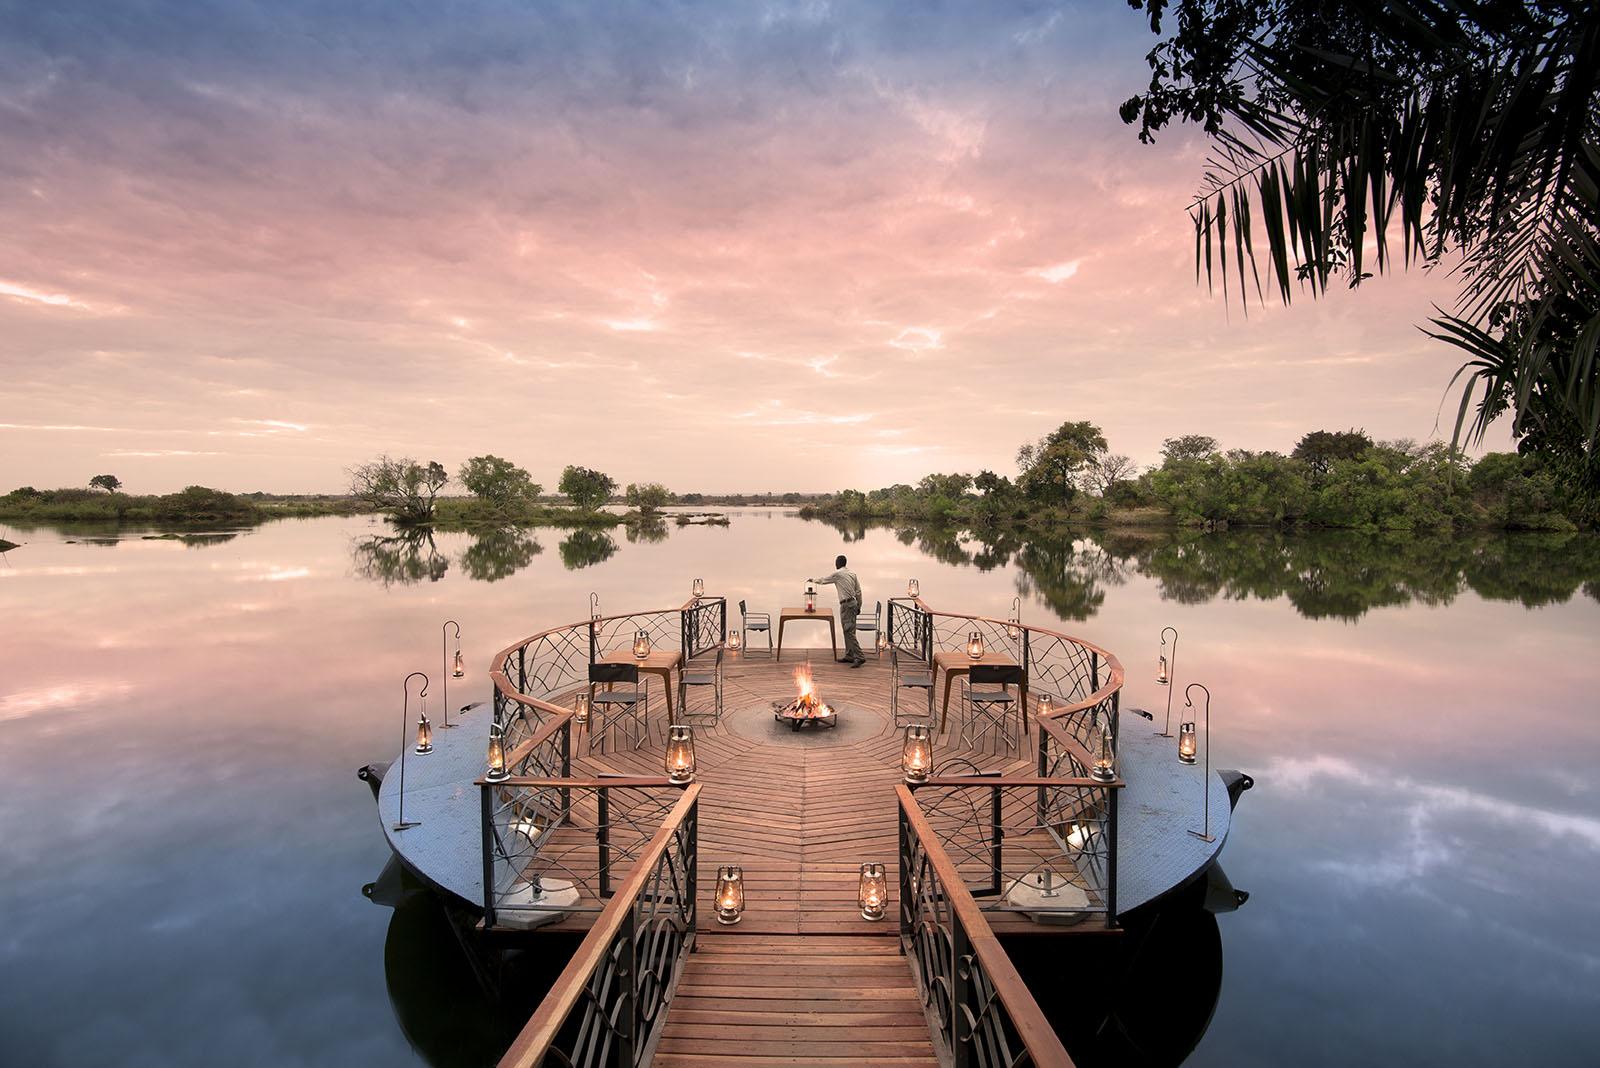 Thorntree-River-Lodge-Livingstone-Zambia-African-Bush-Camps-Luxury-Safari-Lodge-57-Floating-Deck.jpg